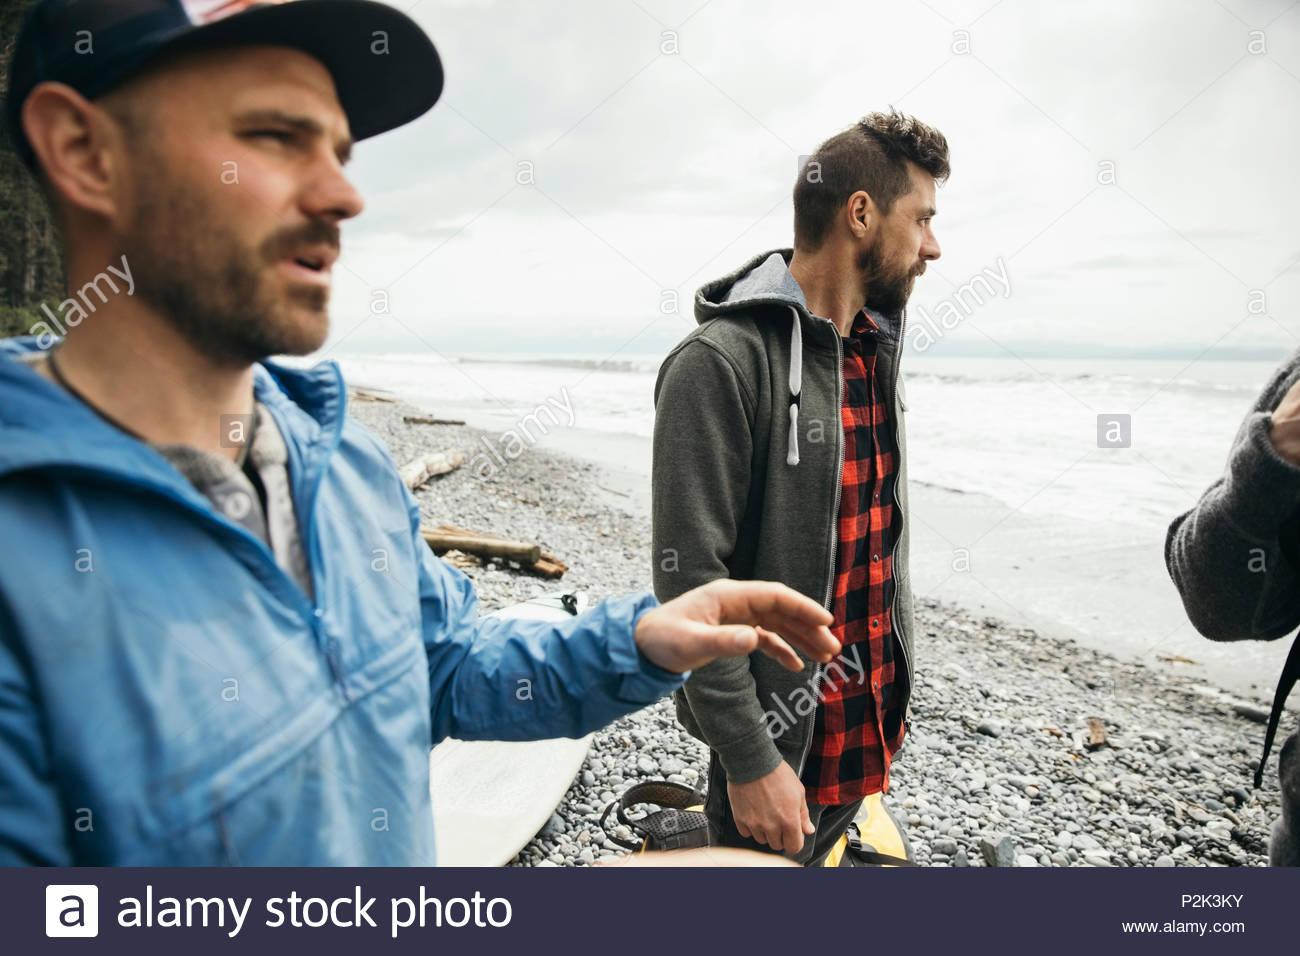 Men friends enjoying weekend surfing getaway on rugged beach - Stock Image